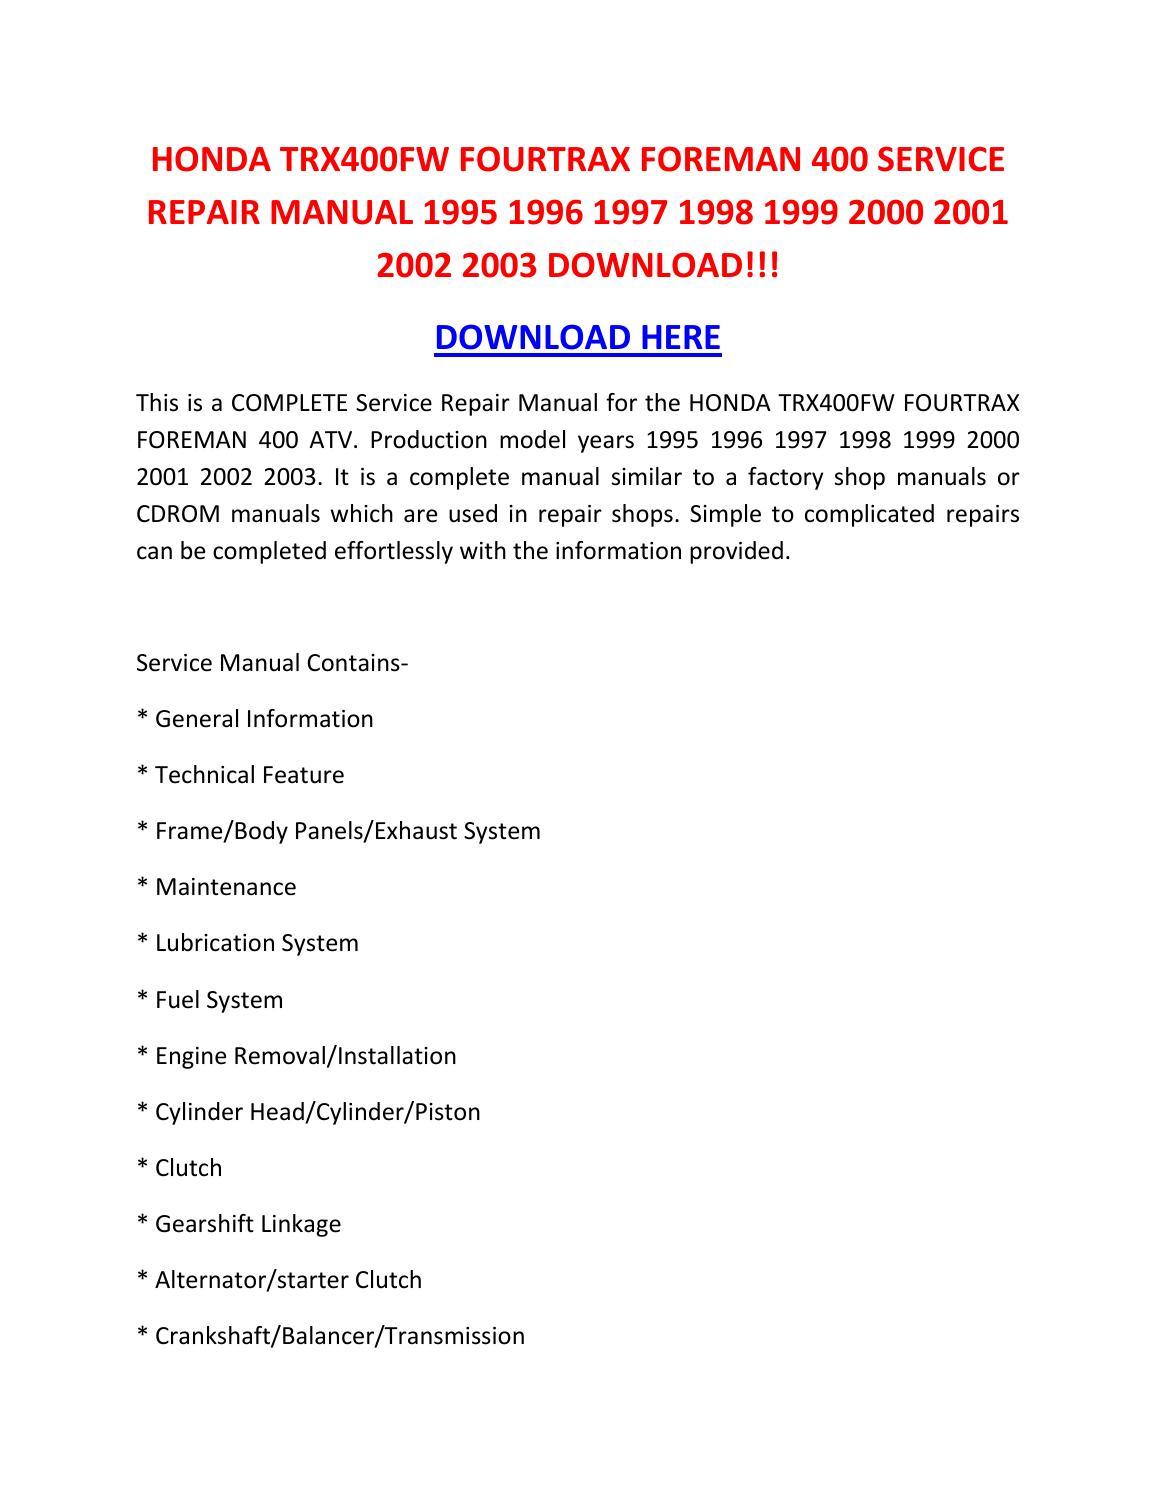 Honda Trx400fw Fourtrax Foreman 400 Service Repair Manual